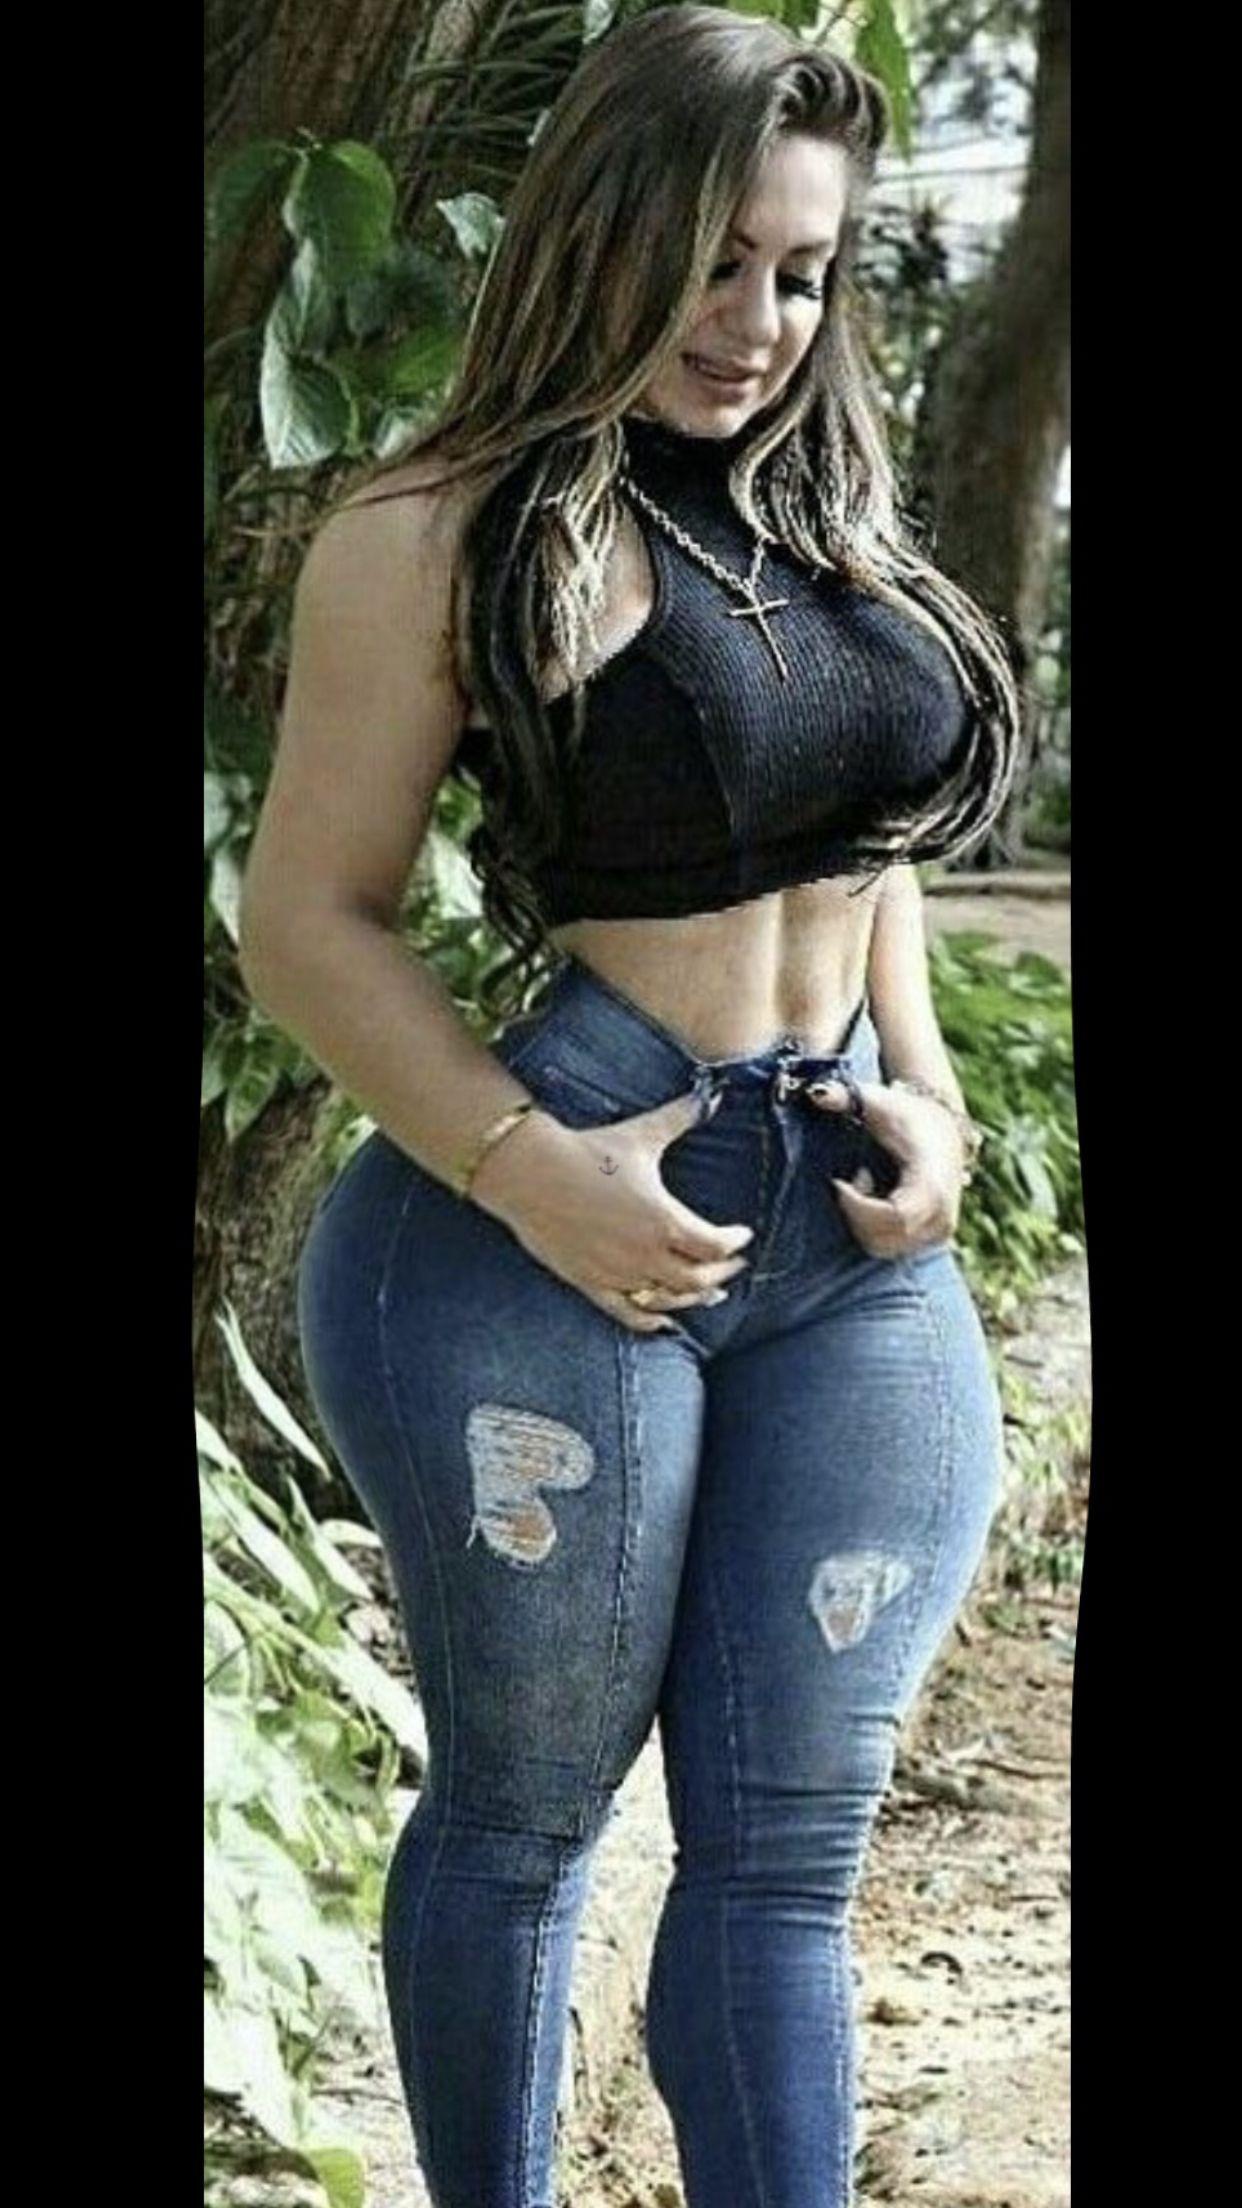 Big Tit Brunette Teen Pov